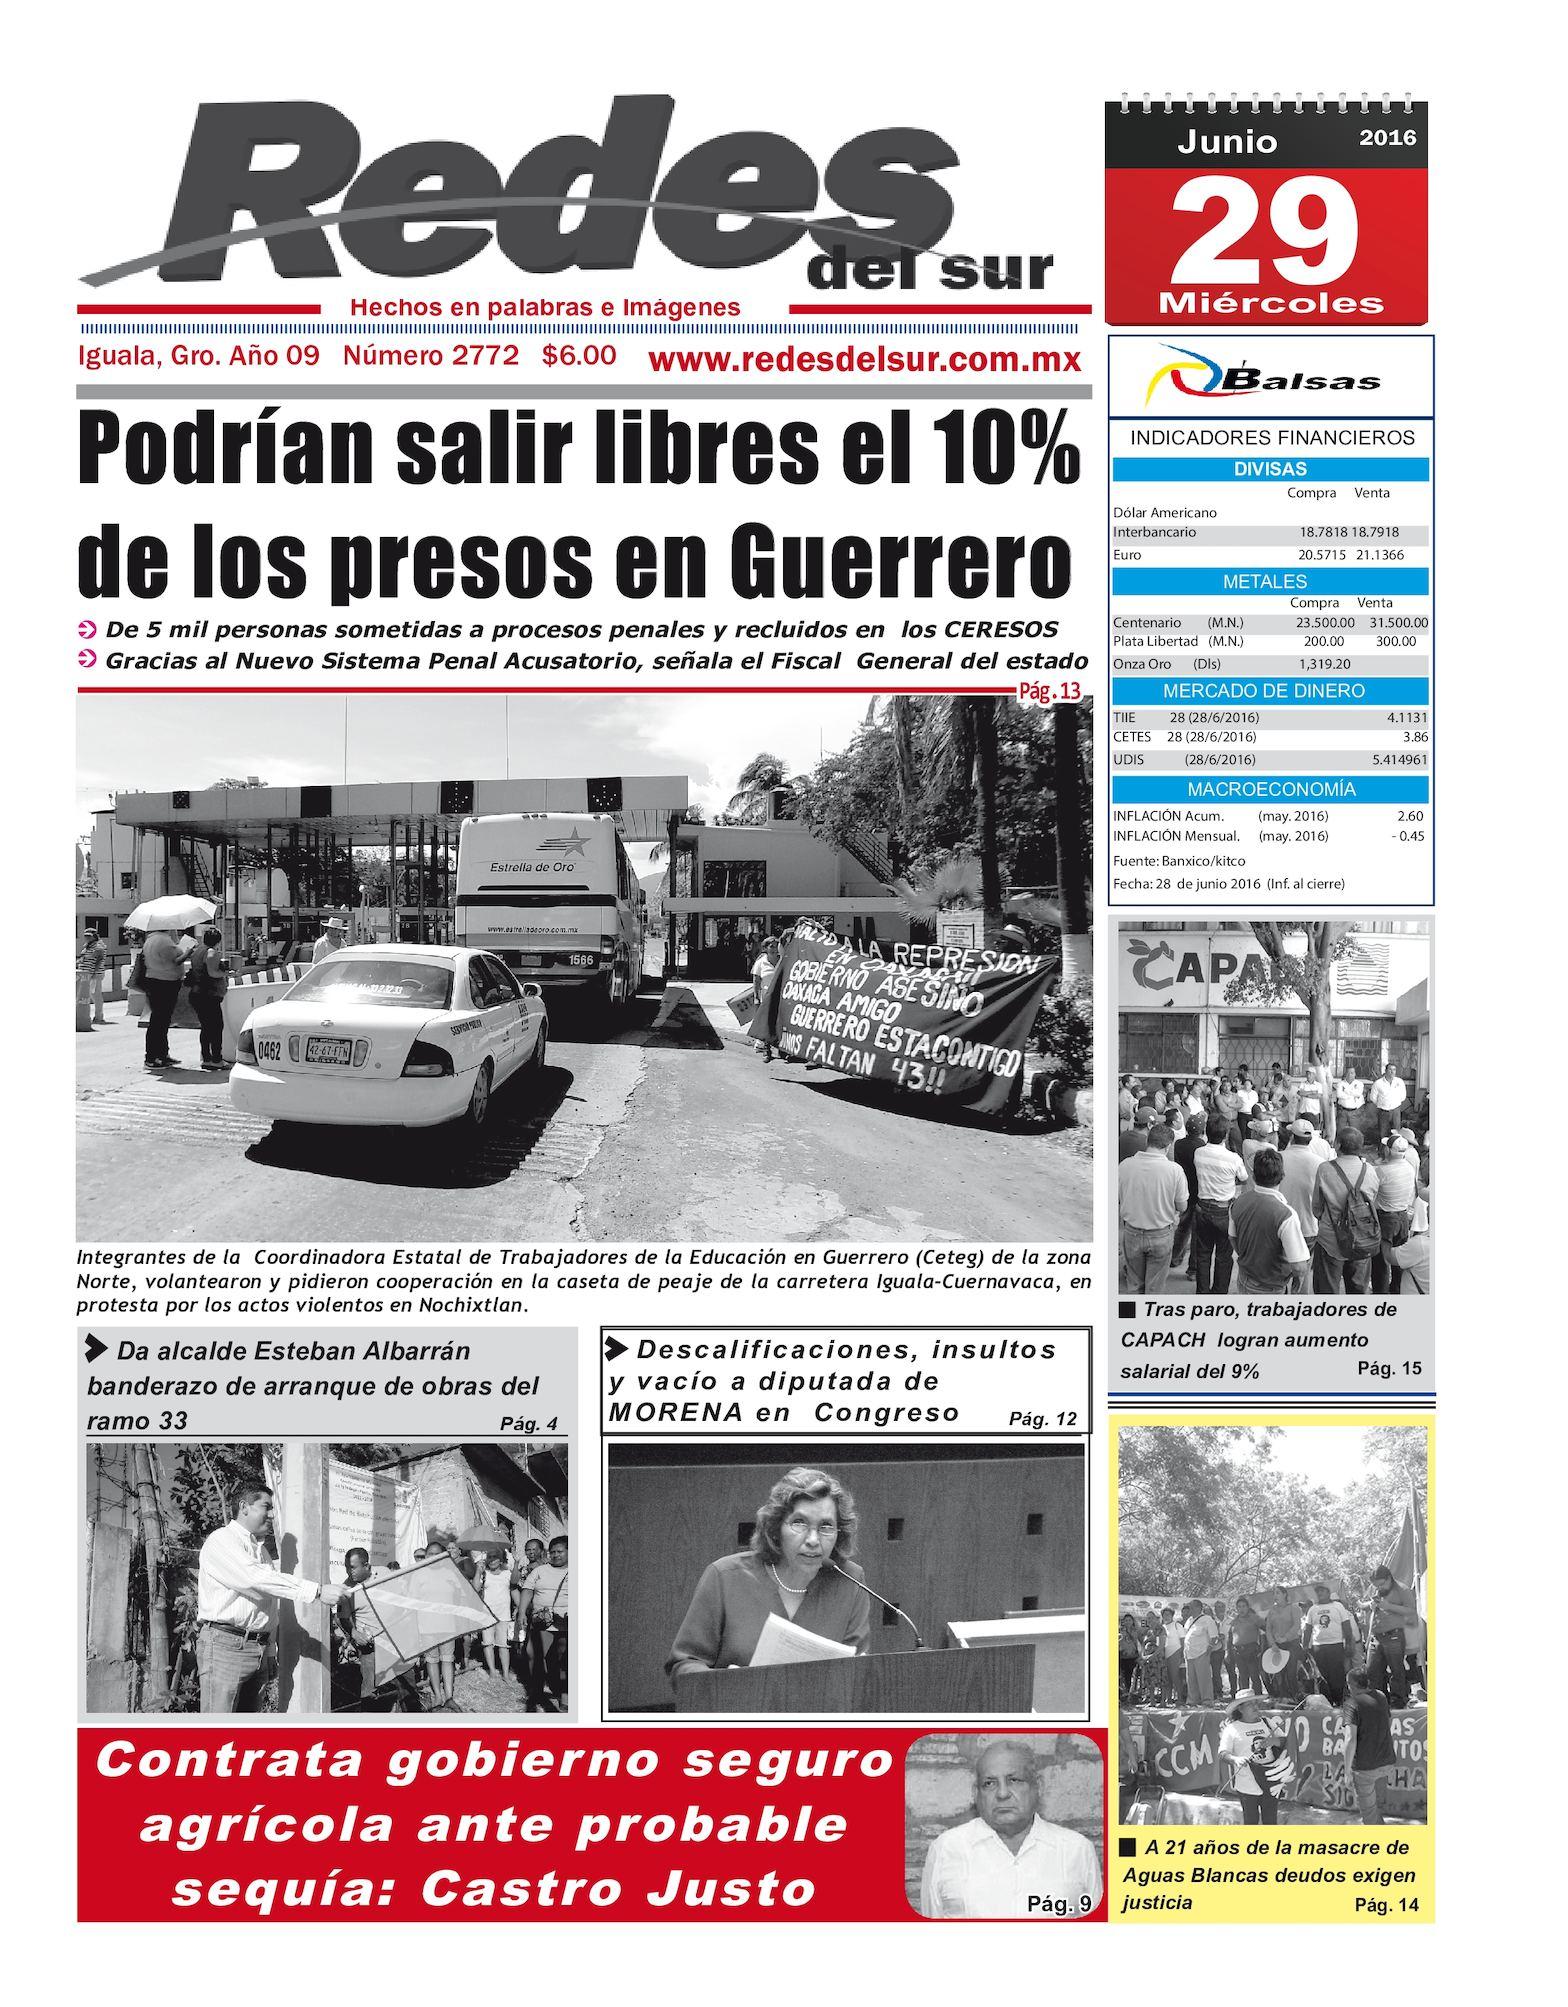 Calaméo - Redes del Sur 29/06/16